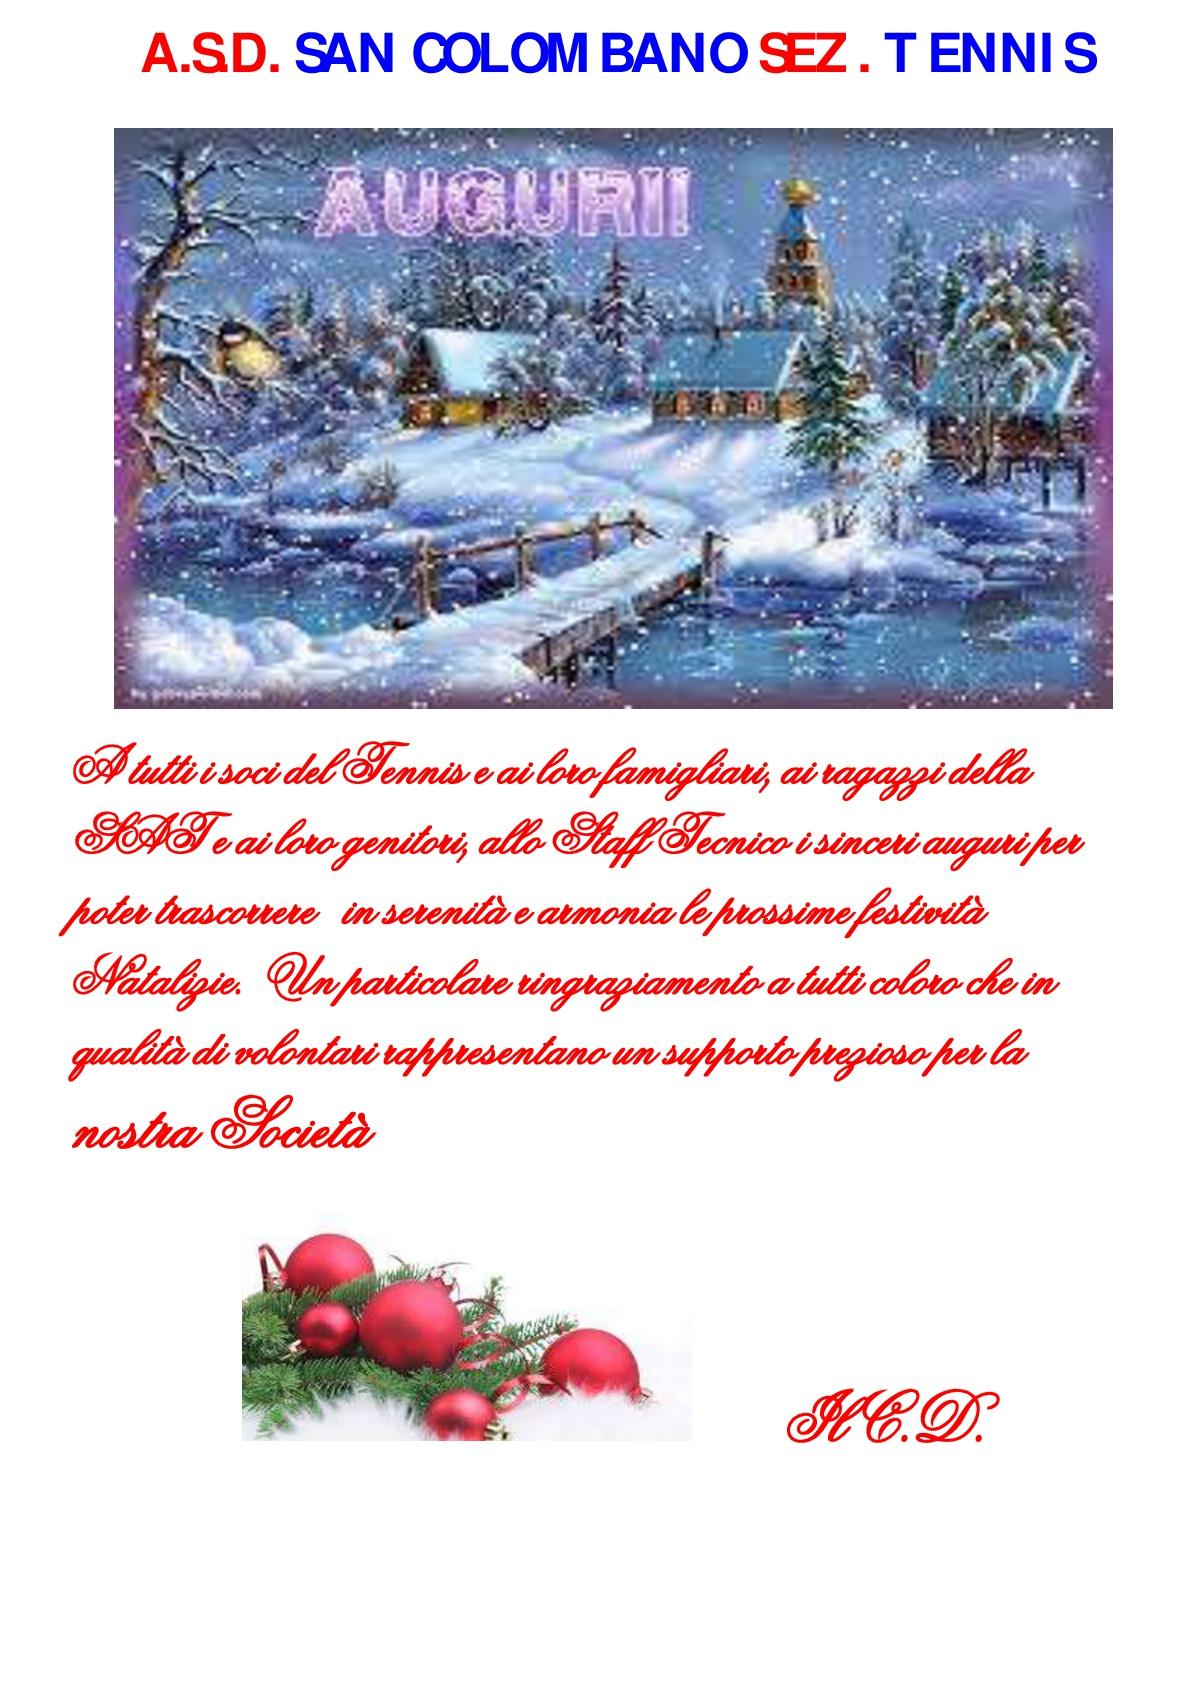 Auguri Di Natale Tennis.Auguri Di Buon Natale Asd San Colombano Tennis